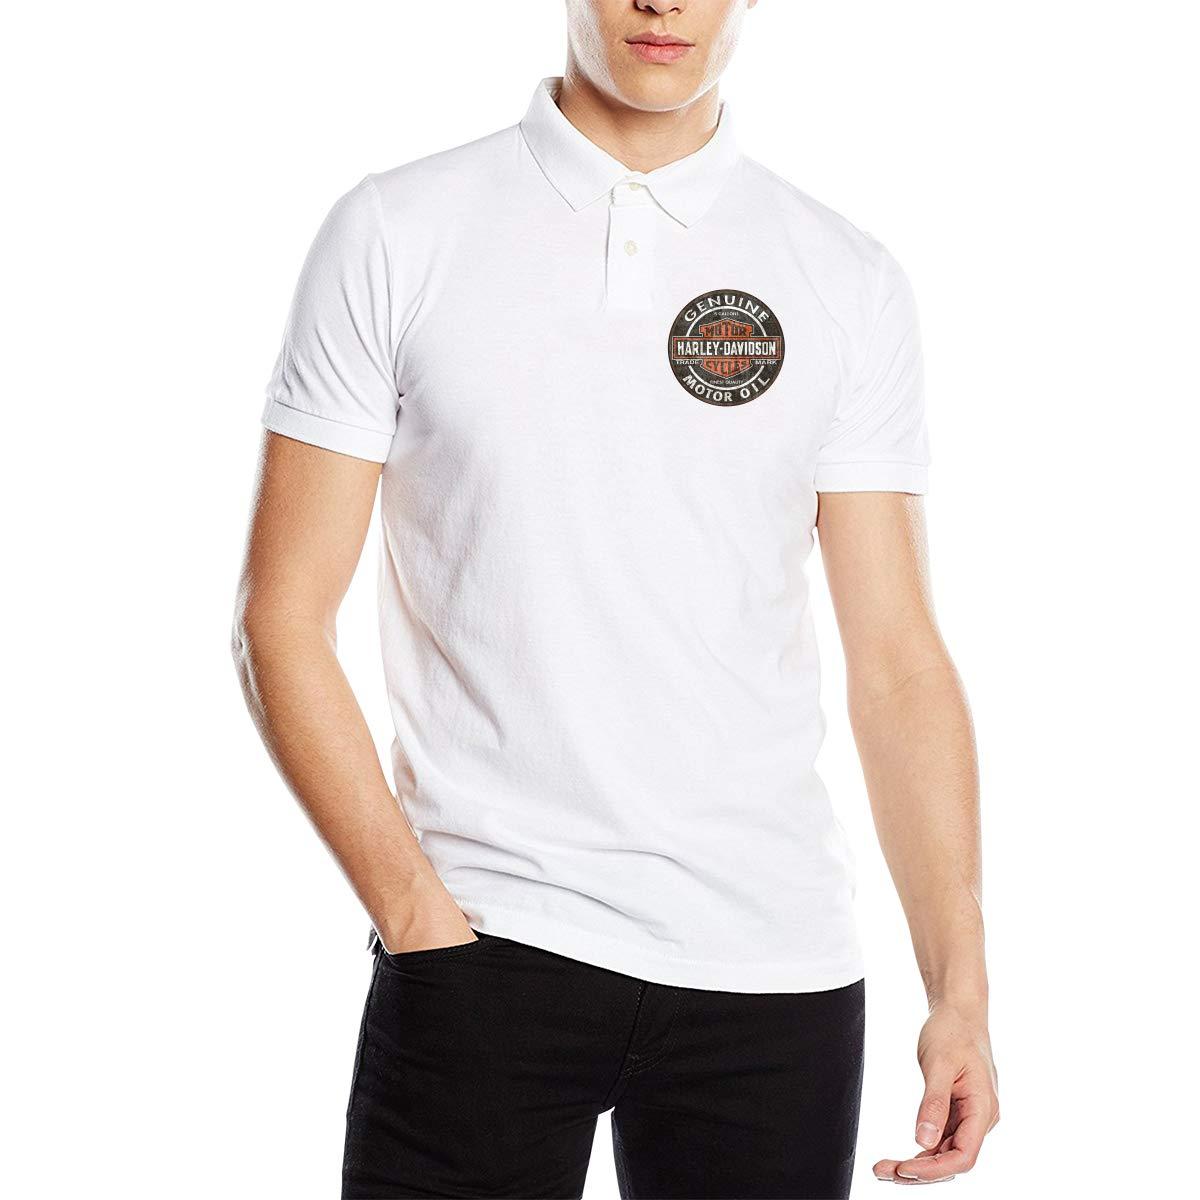 HUALA New Designed T Shirt Harley Davidson Fashion Polo Shirt O-Neck for Men Black